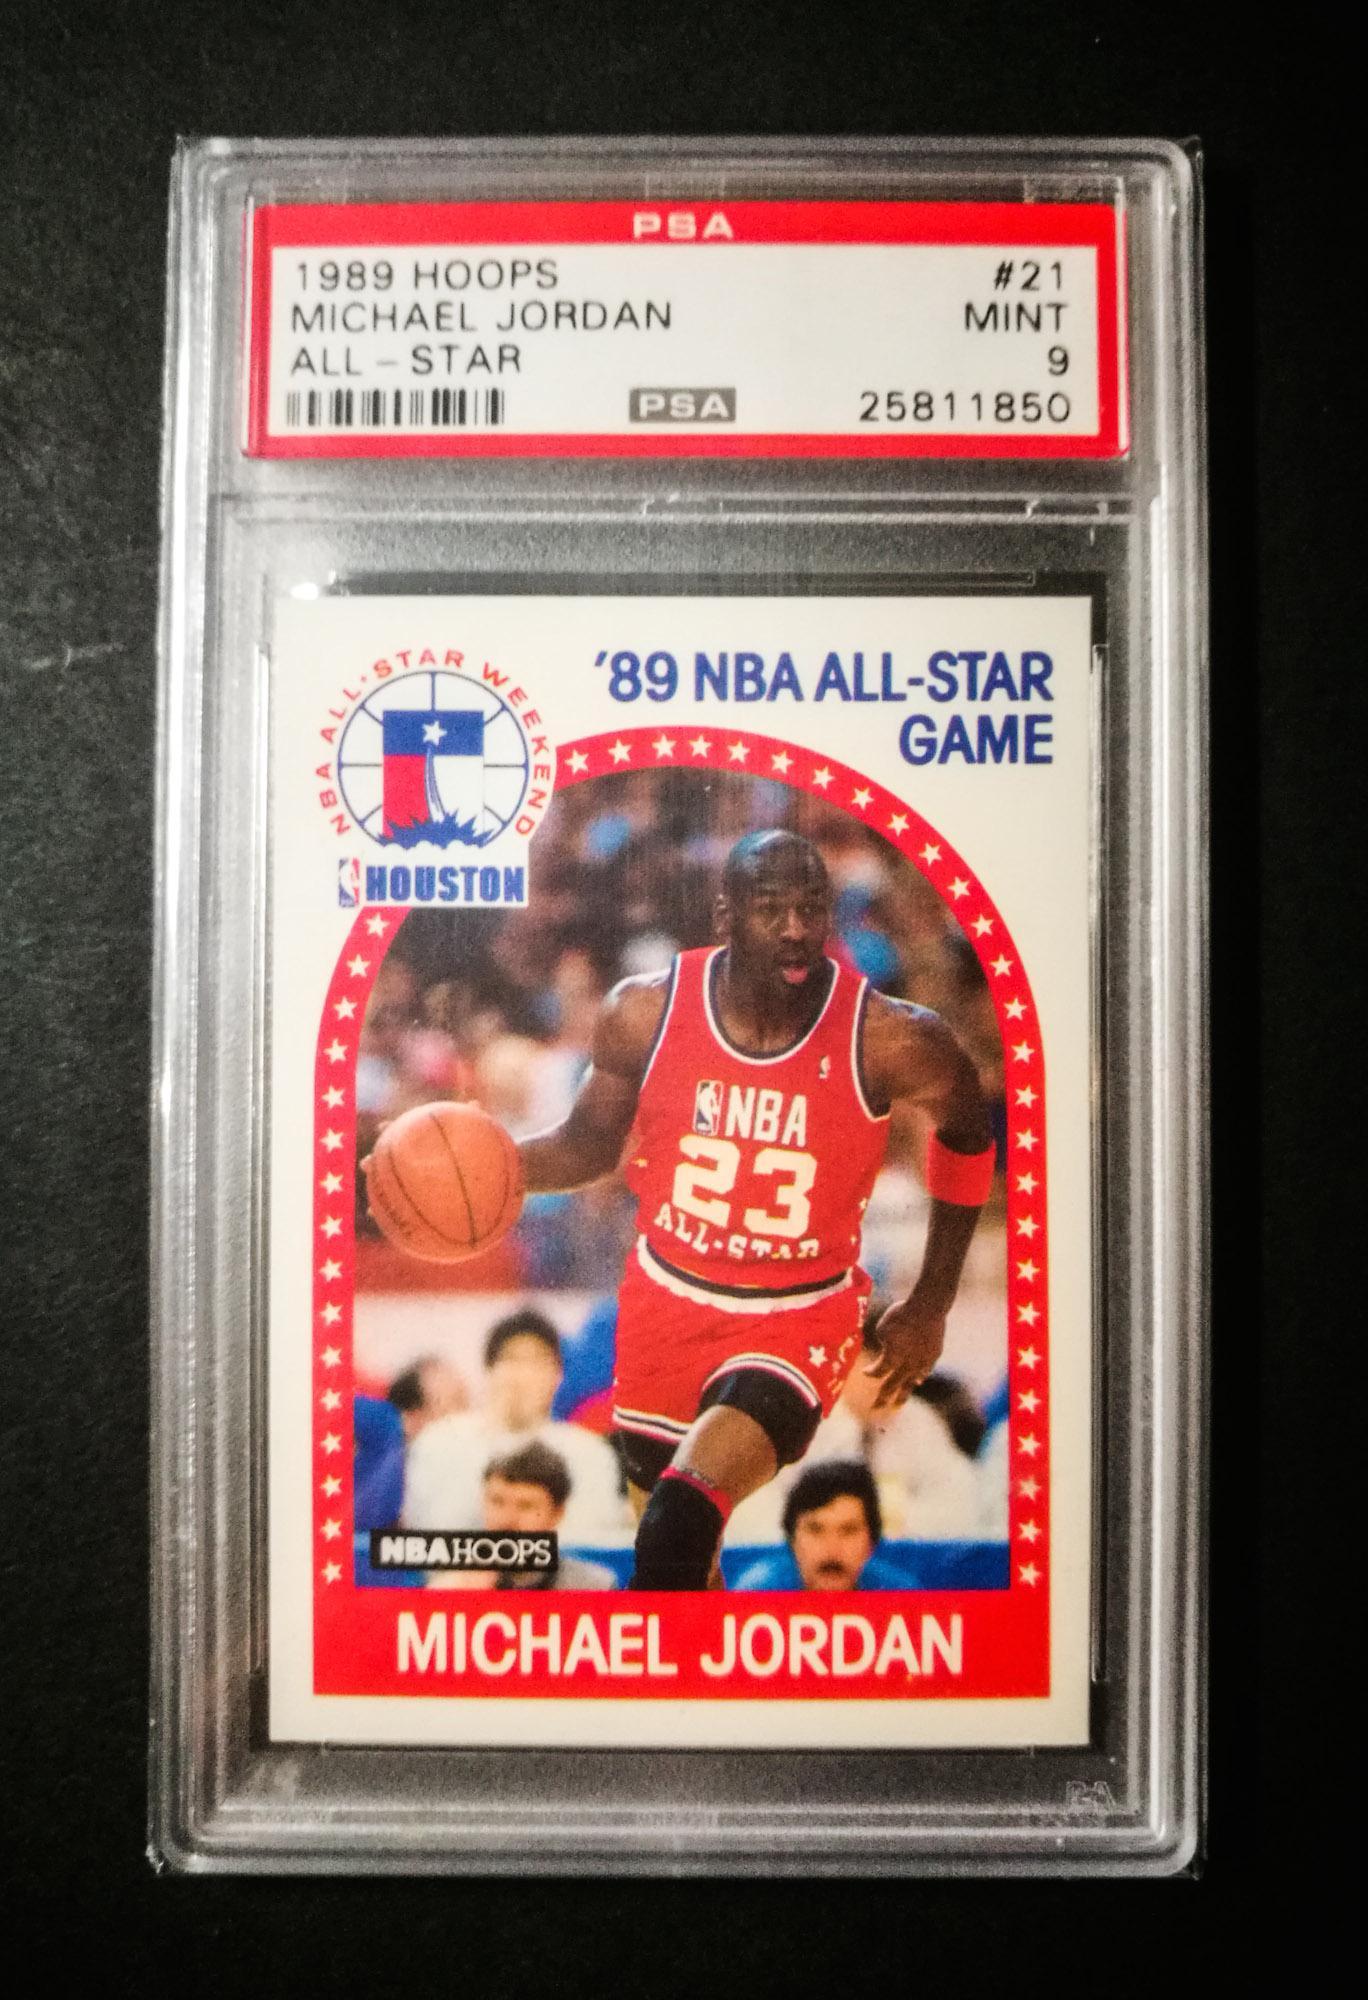 7835c3af99c Michael Jordan 1989 Hoops All-Star  21 PSA 9 MINT Basketball Card